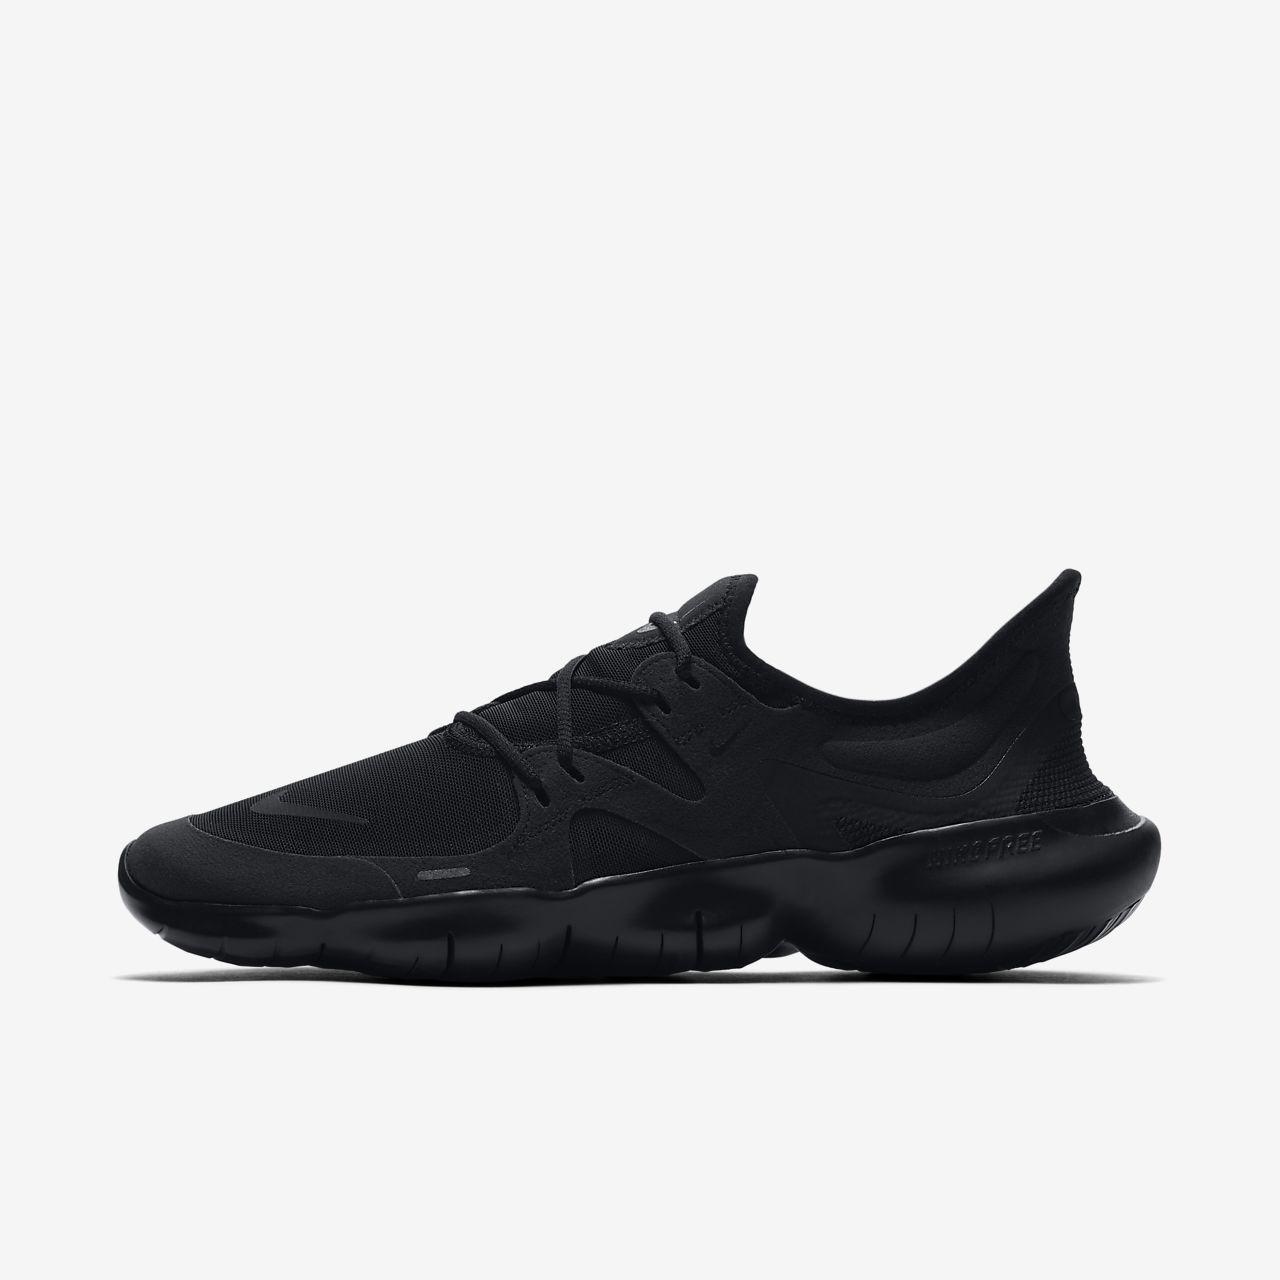 sale retailer 37cbf 83523 Nike Free RN 5.0